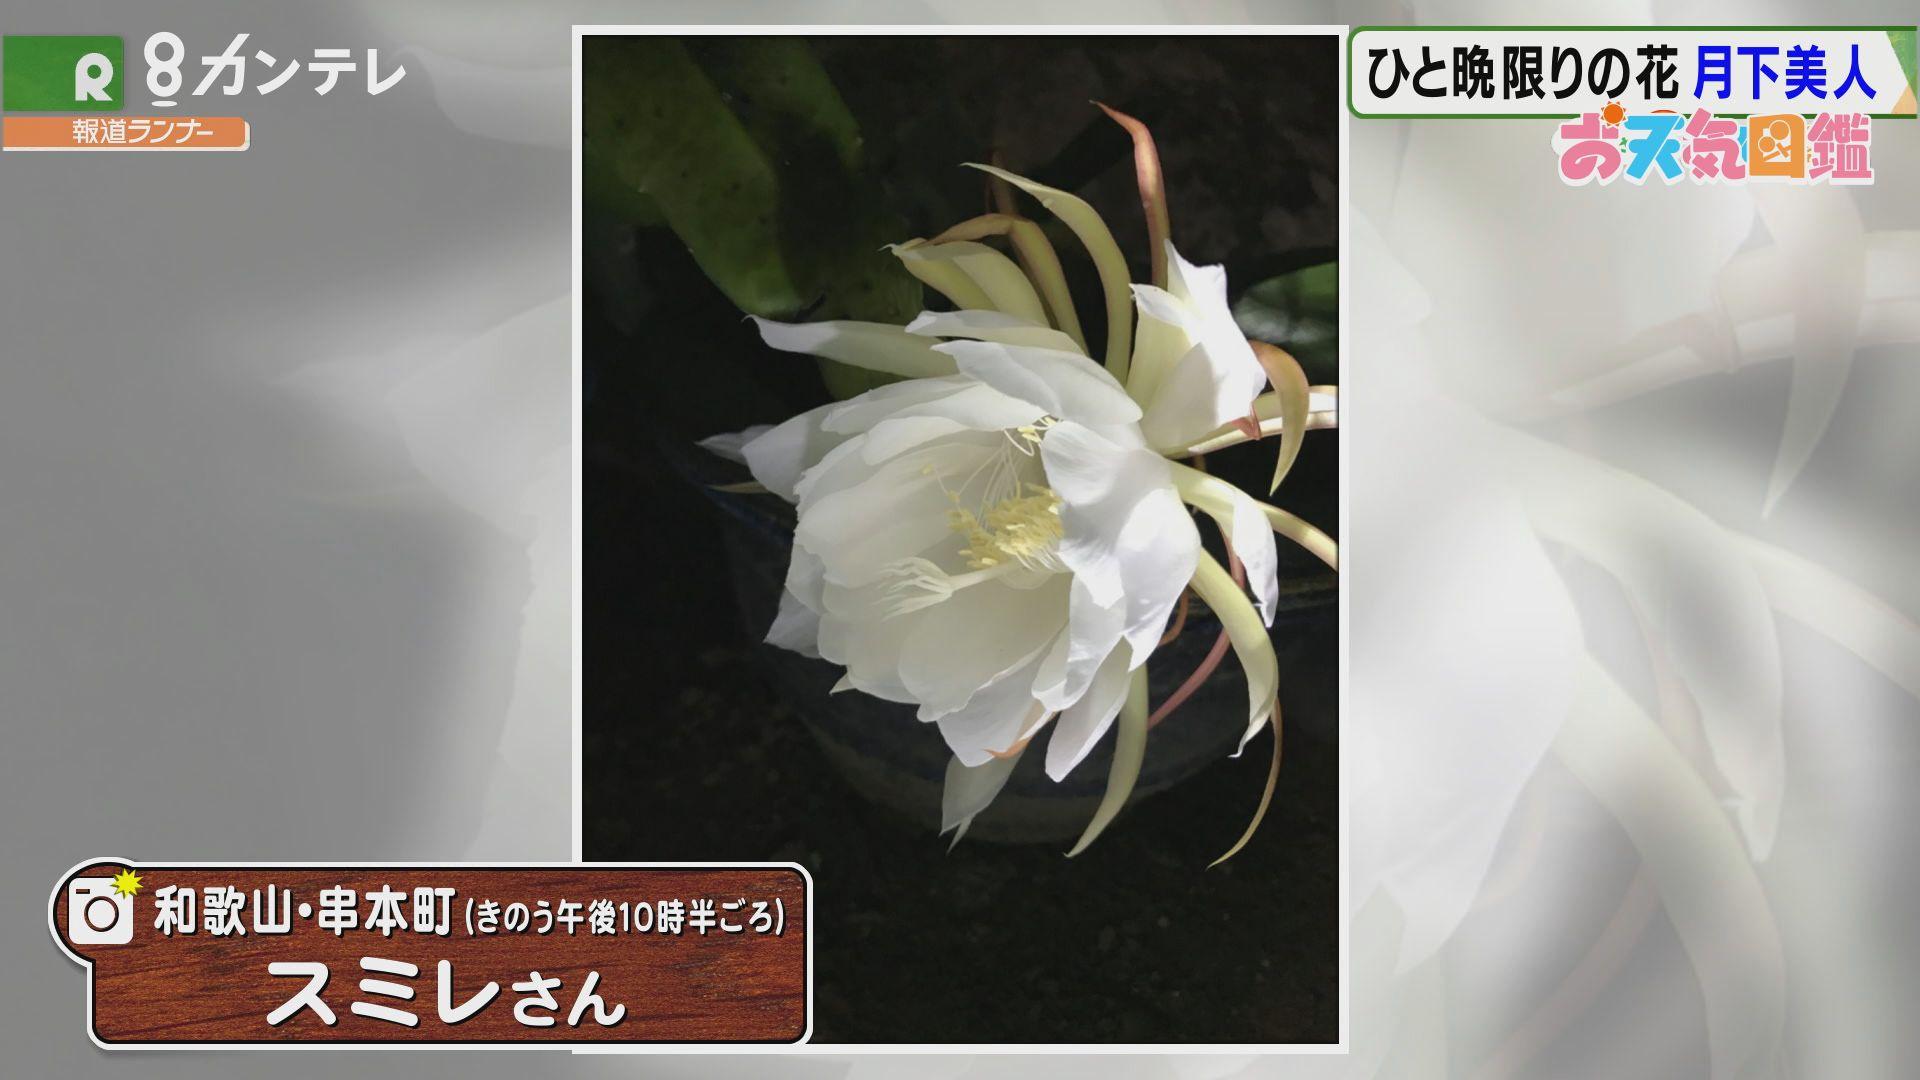 「一夜限りの花 月下美人」(和歌山・串本町)